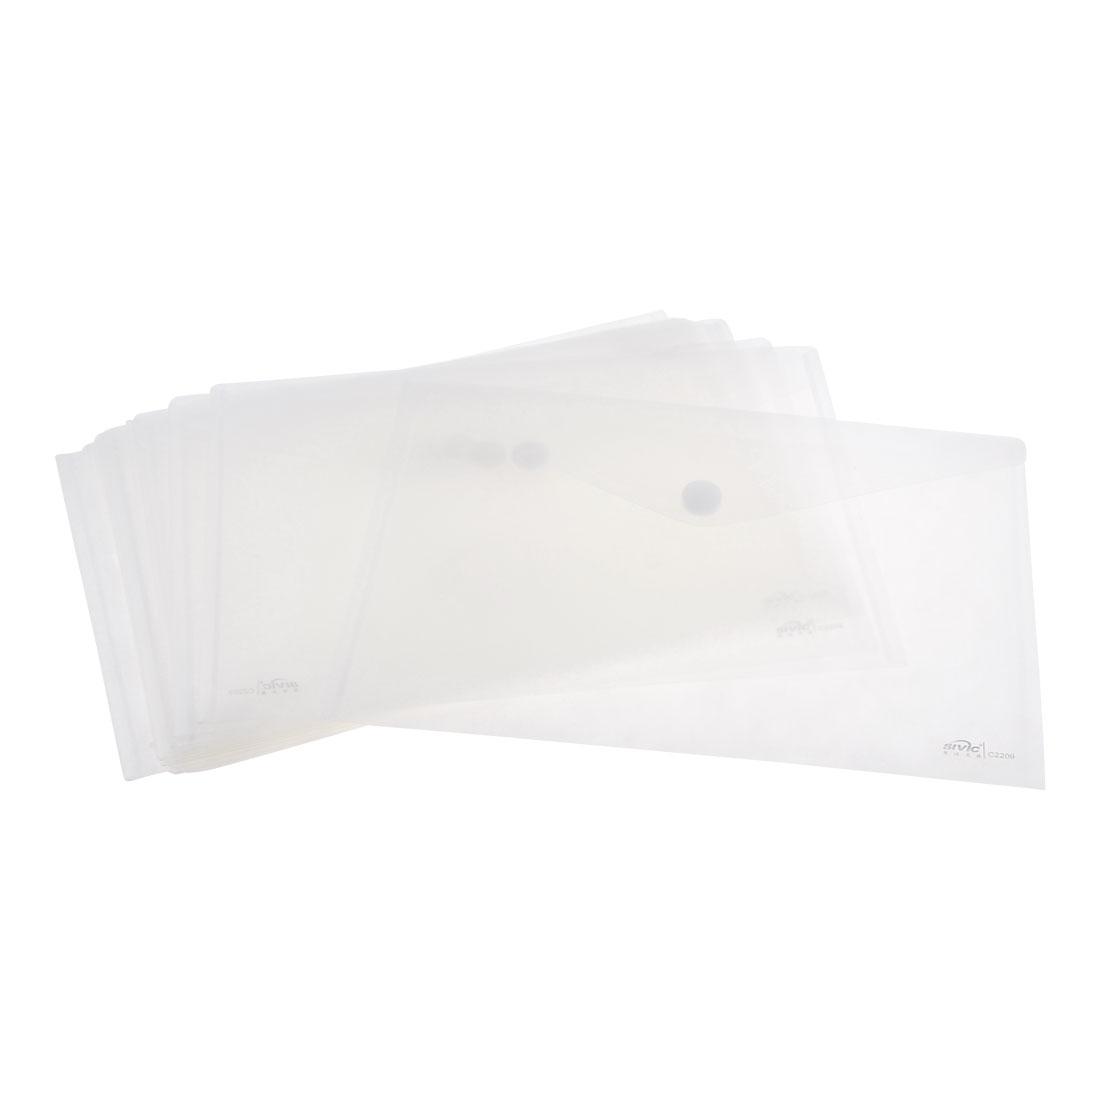 12 Pcs Clear Plastic A4 Side Hook Loop Fastener Paper File Document Holder